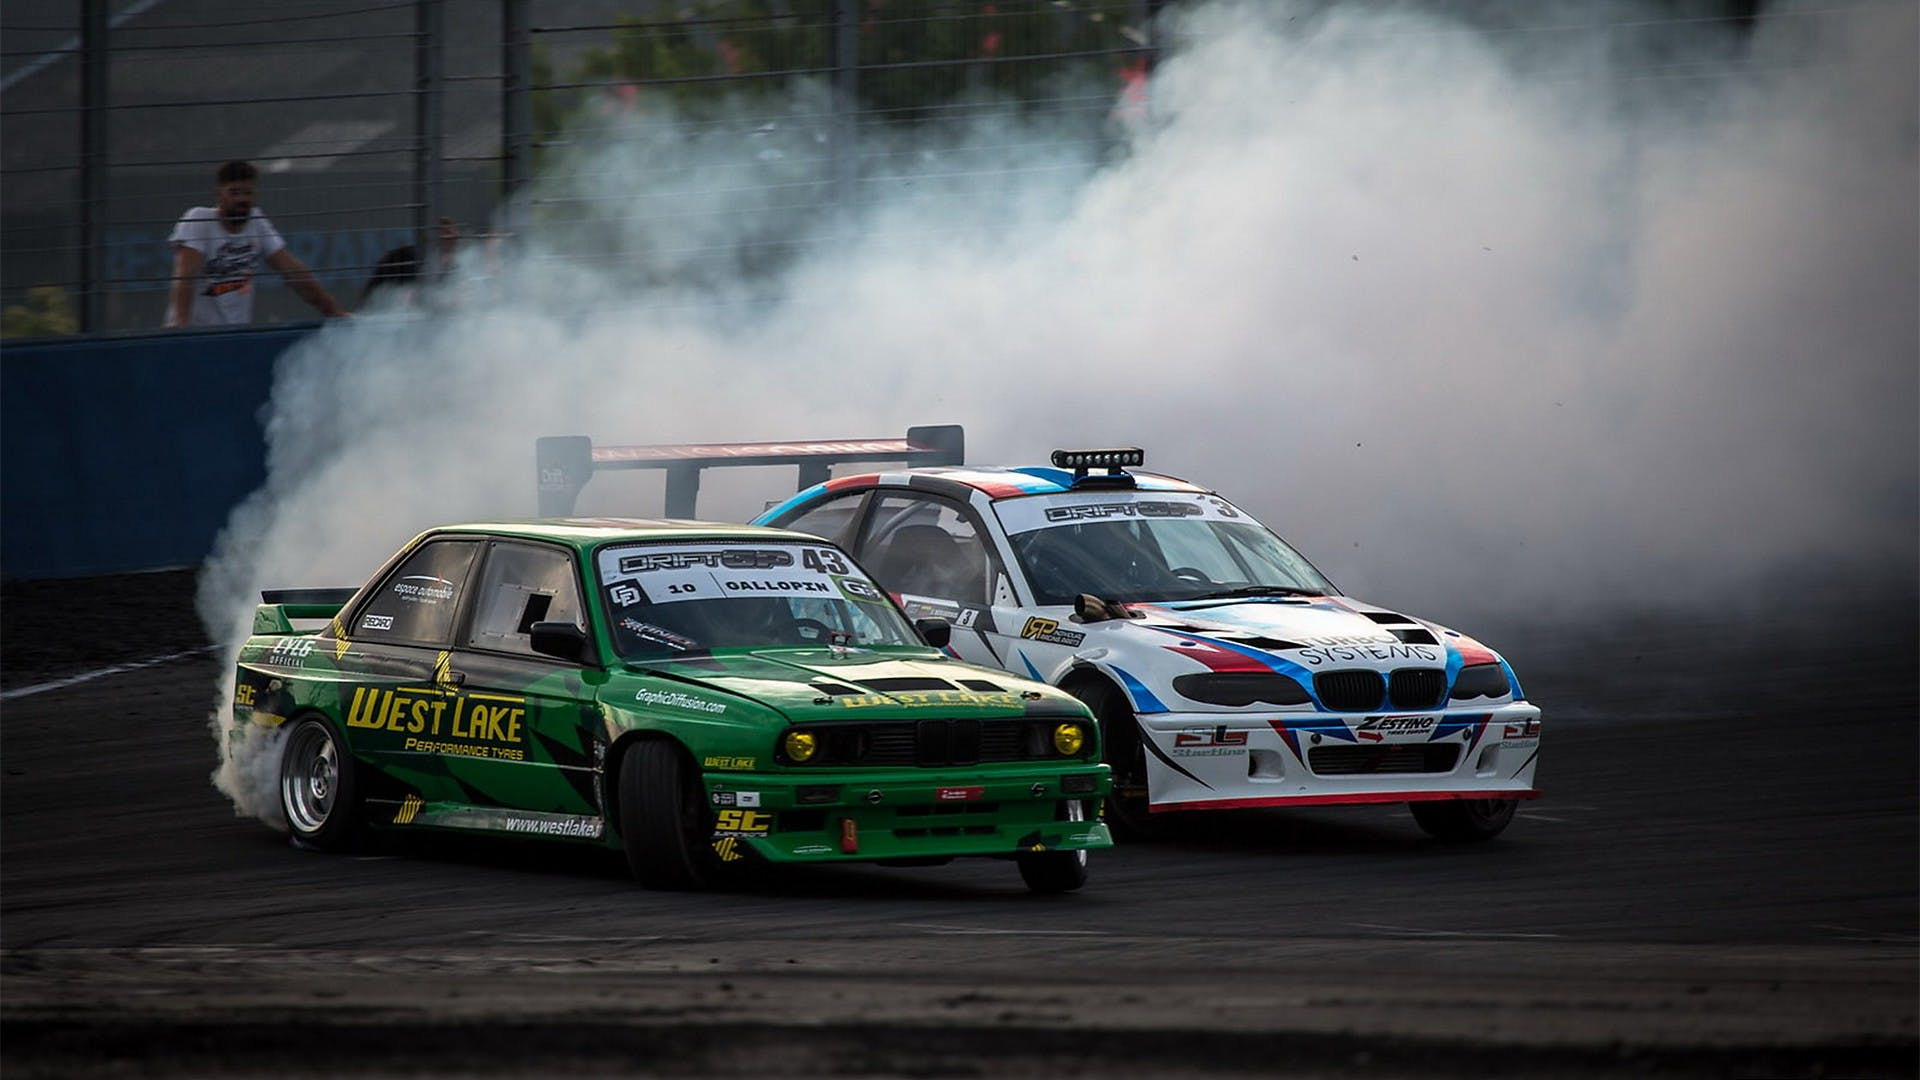 Motor Show drifting